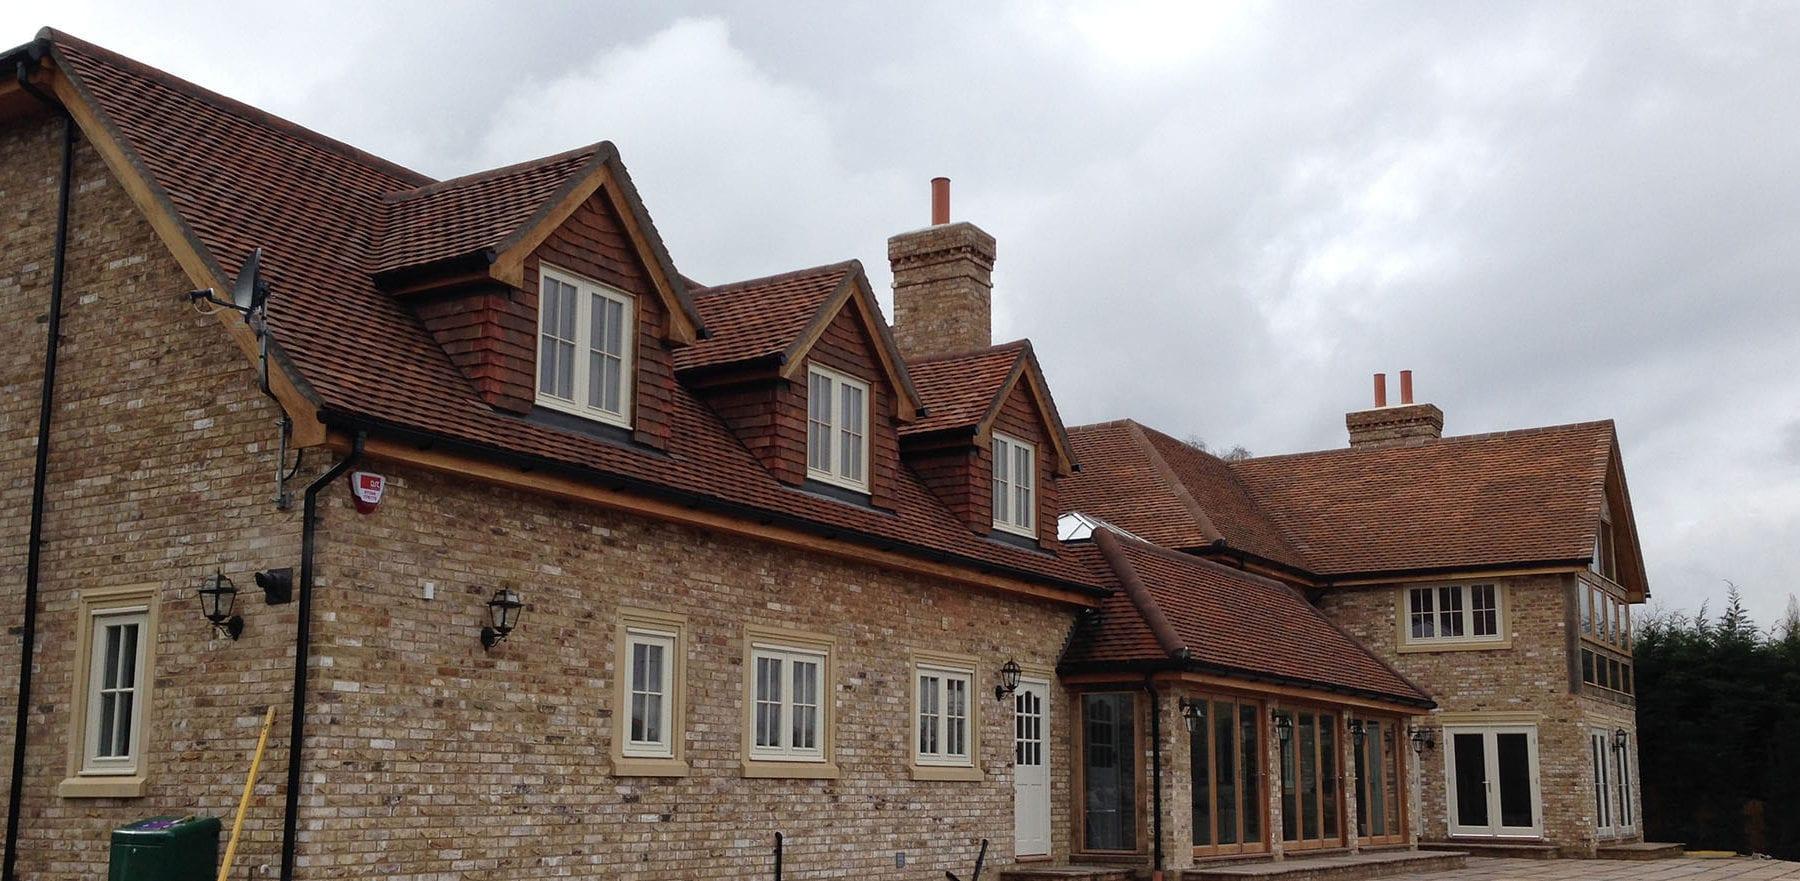 Lifestiles - Handmade Brown Clay Roof Tiles - Sunningdale, England 4